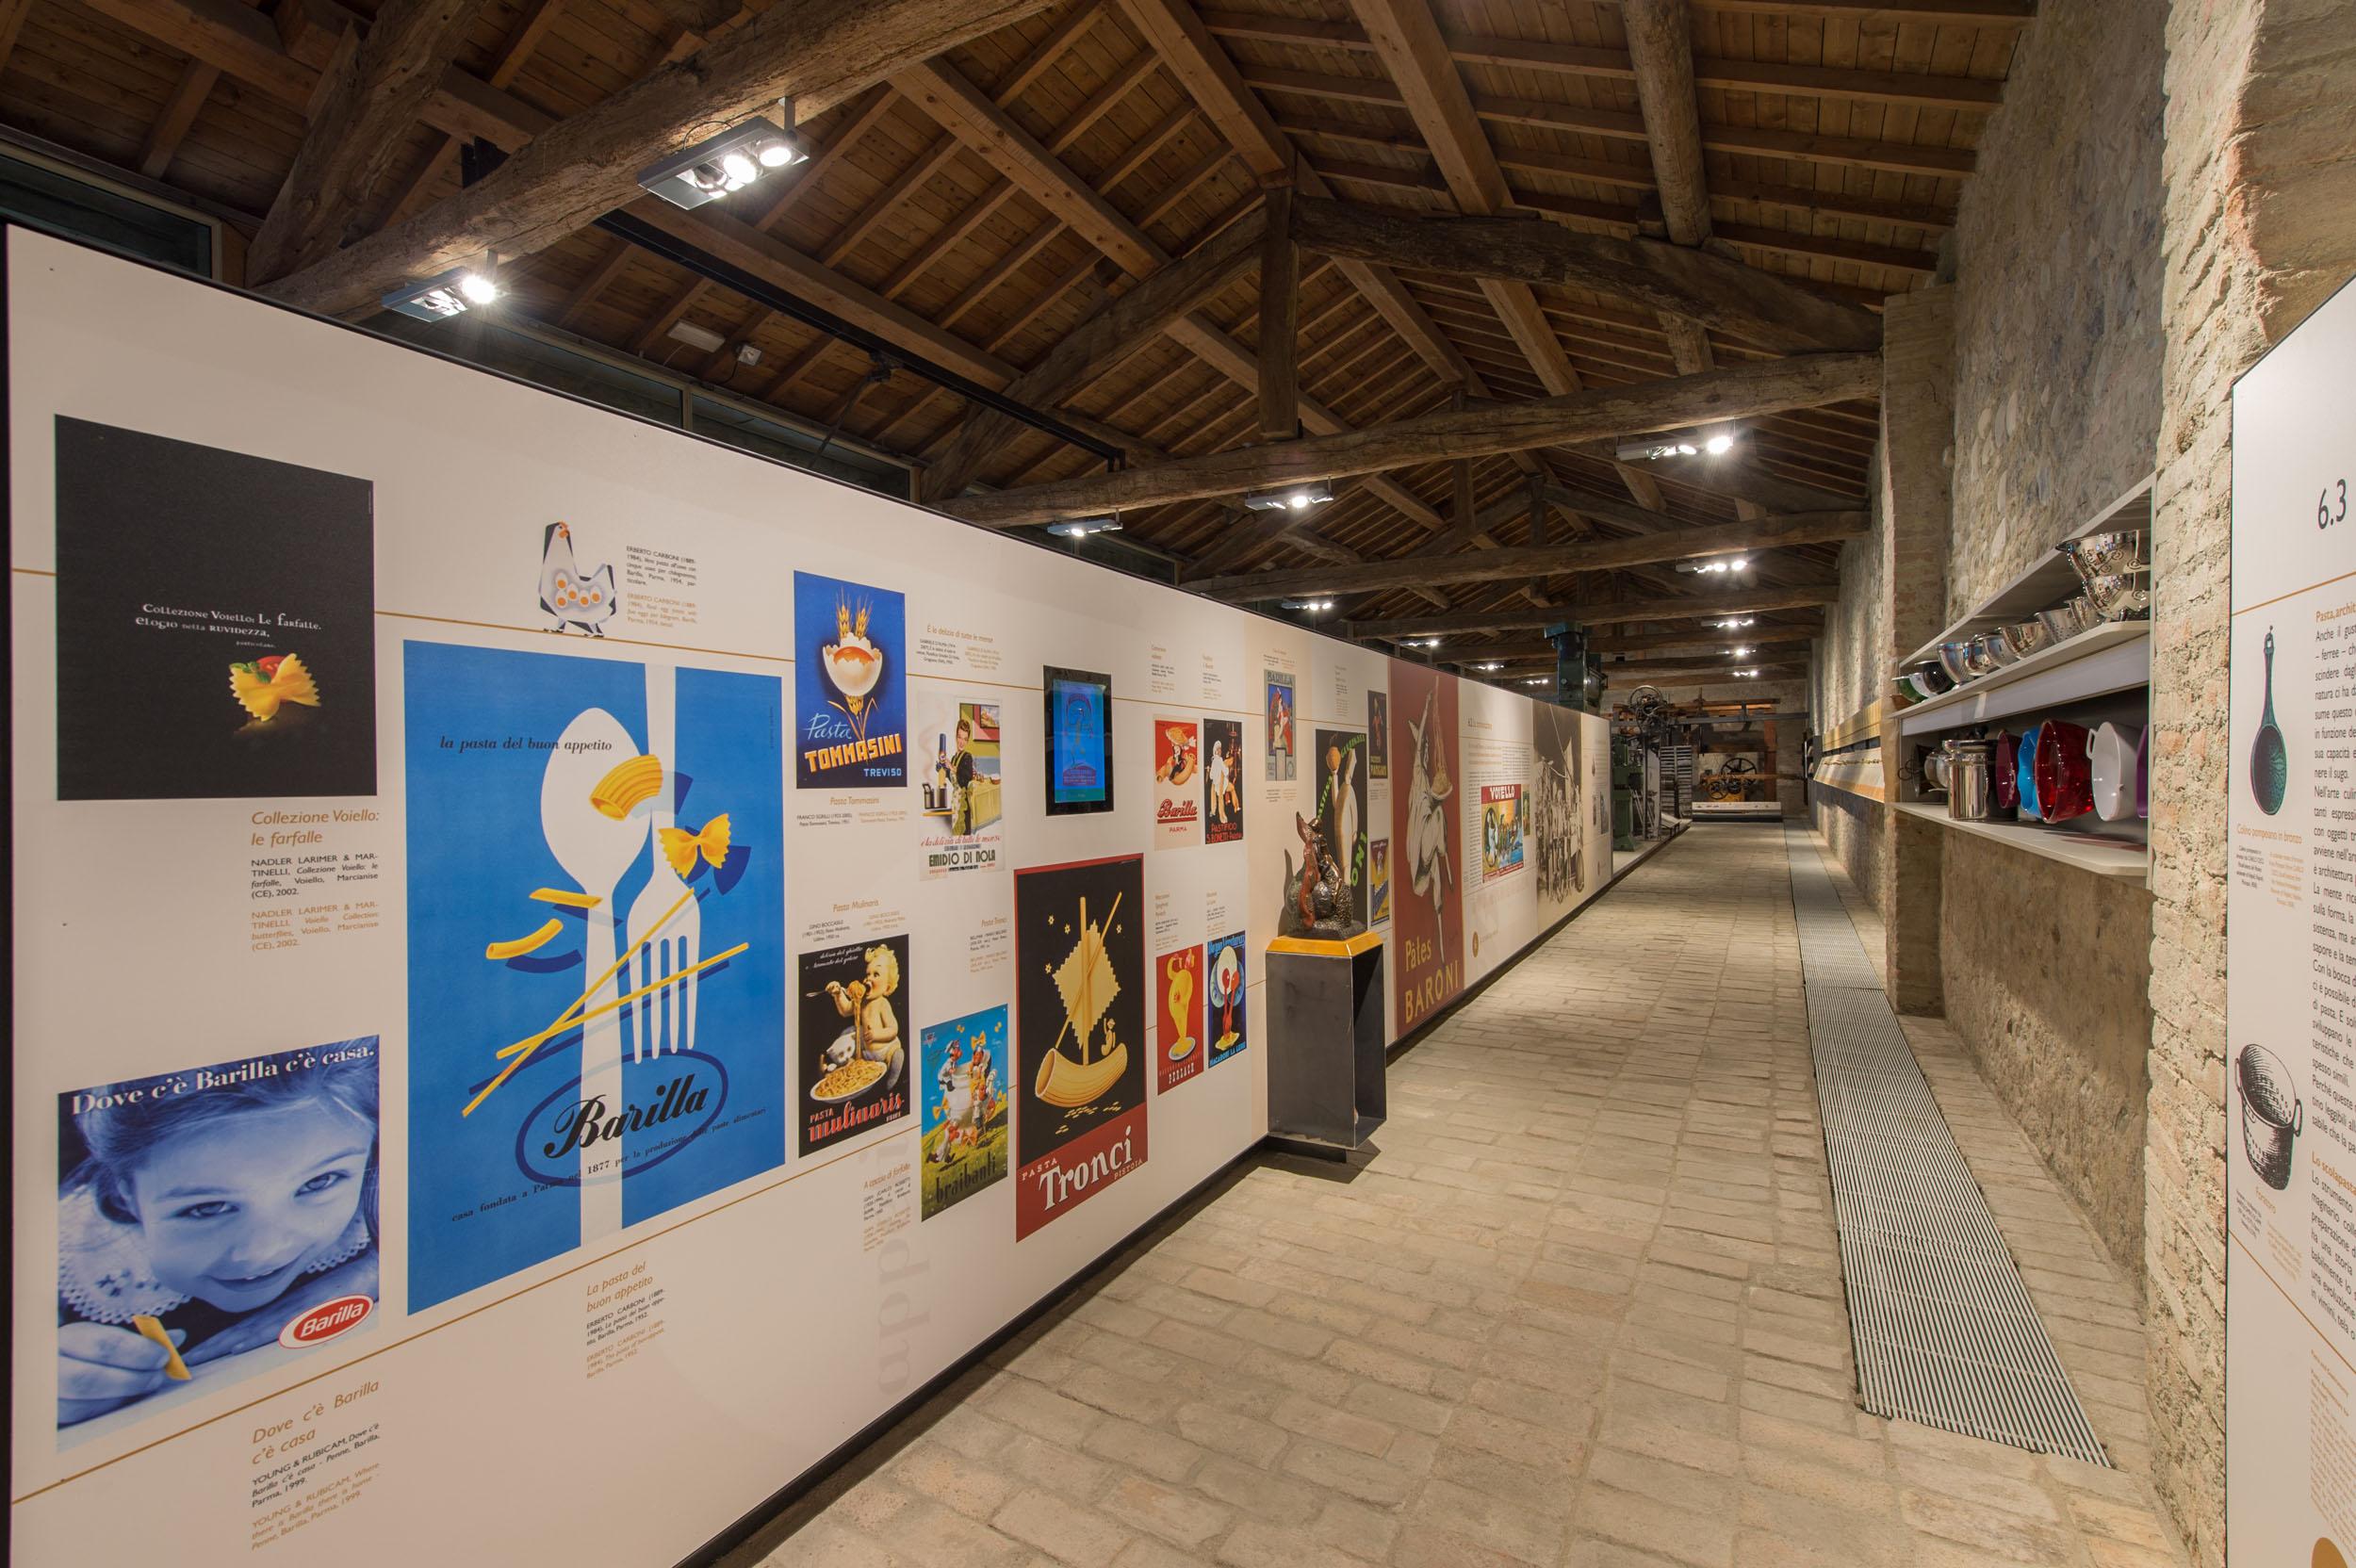 Pasta Museum in Collecchio (PR), interior n. 6 (Picture by L. Rossi)